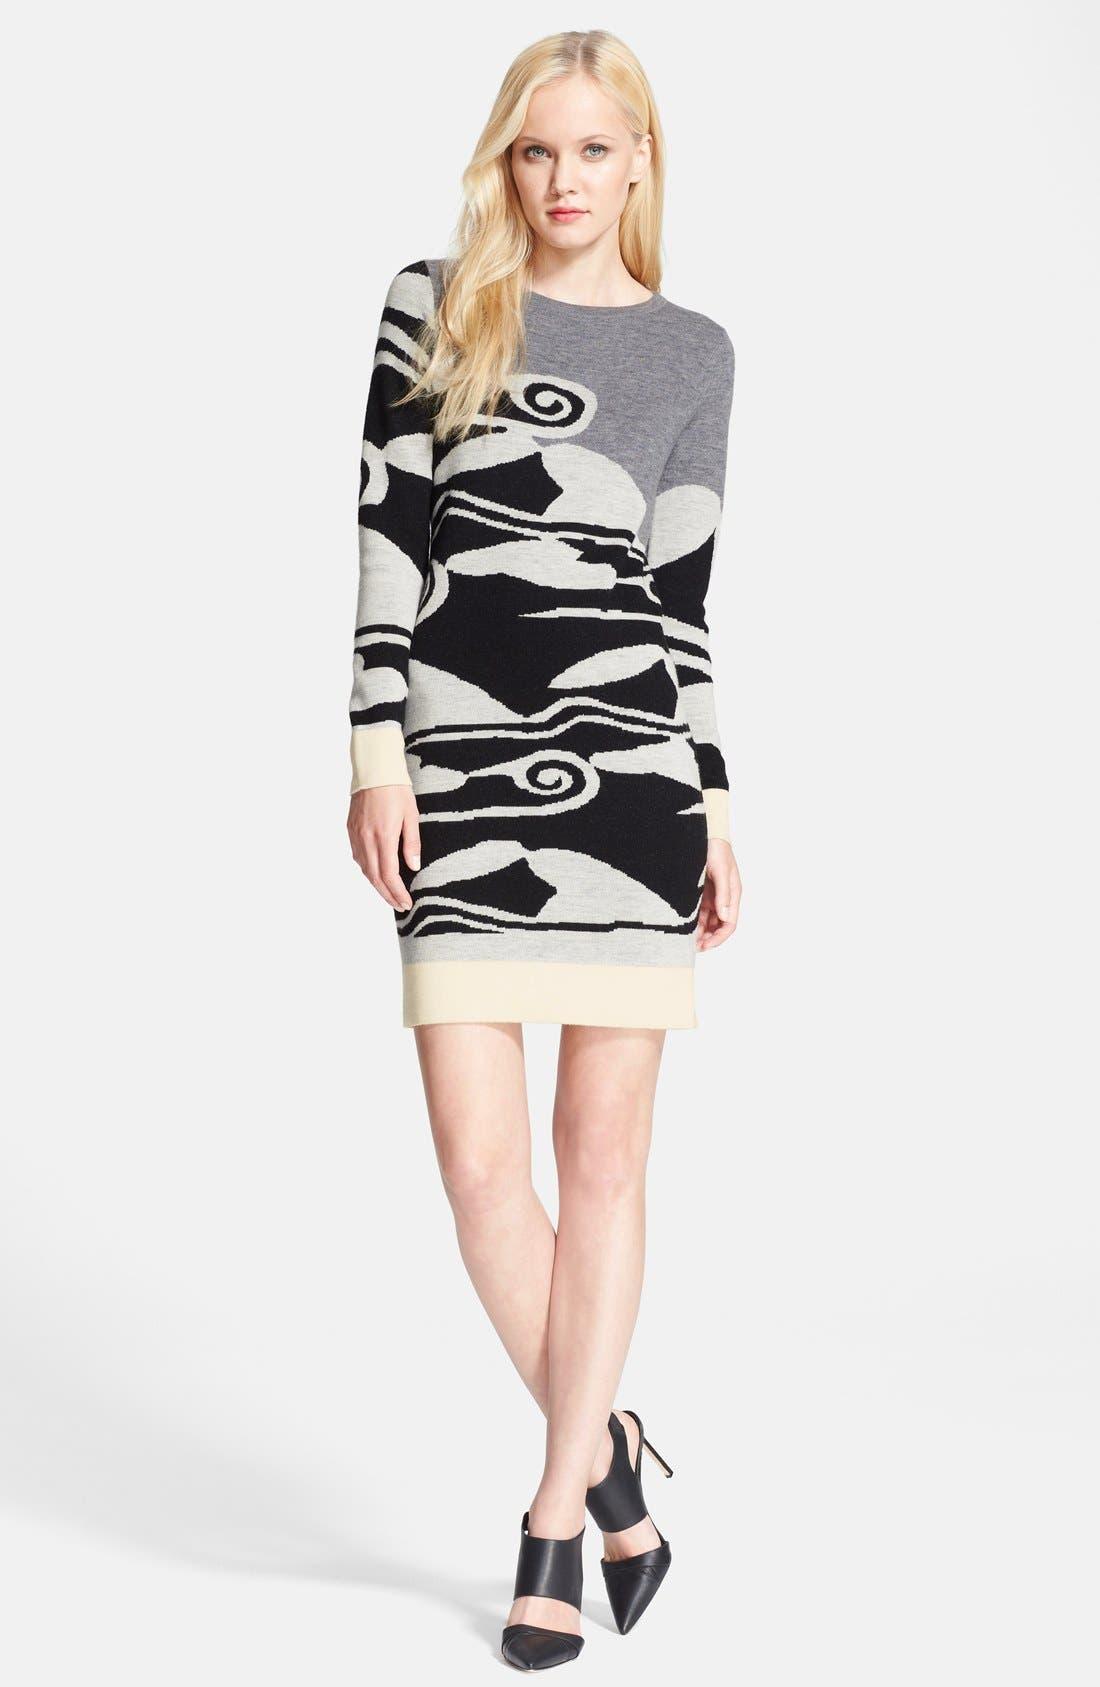 Alternate Image 1 Selected - Diane von Furstenberg 'Look 3' Wool Dress